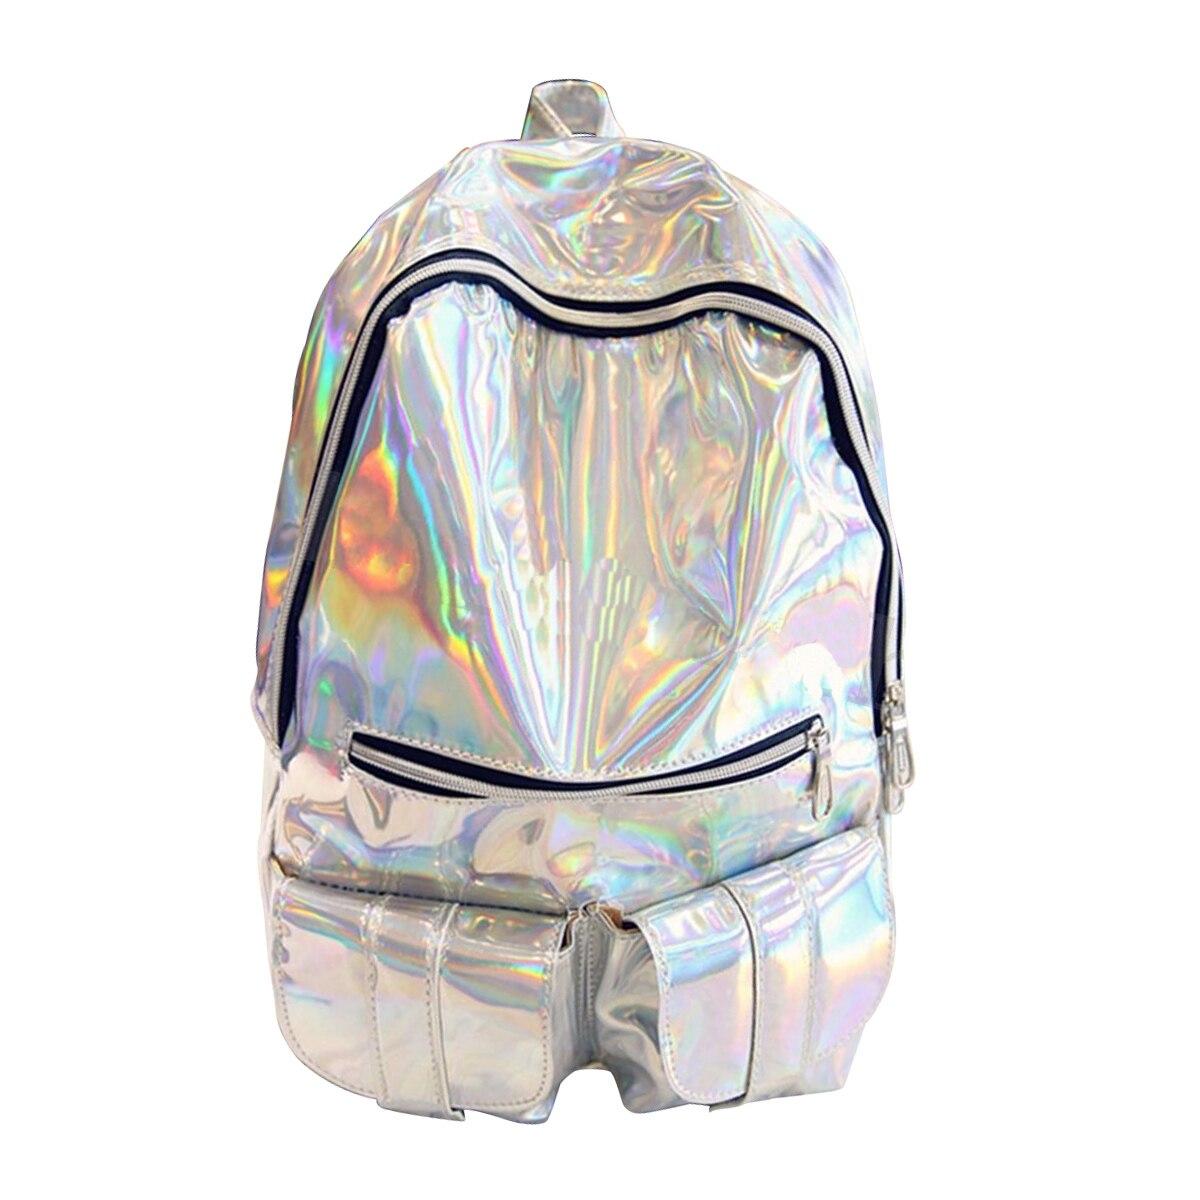 TFTP голографический рюкзак Gammaray голограмма женский рюкзак мужская сумка кожаный голографический рюкзак